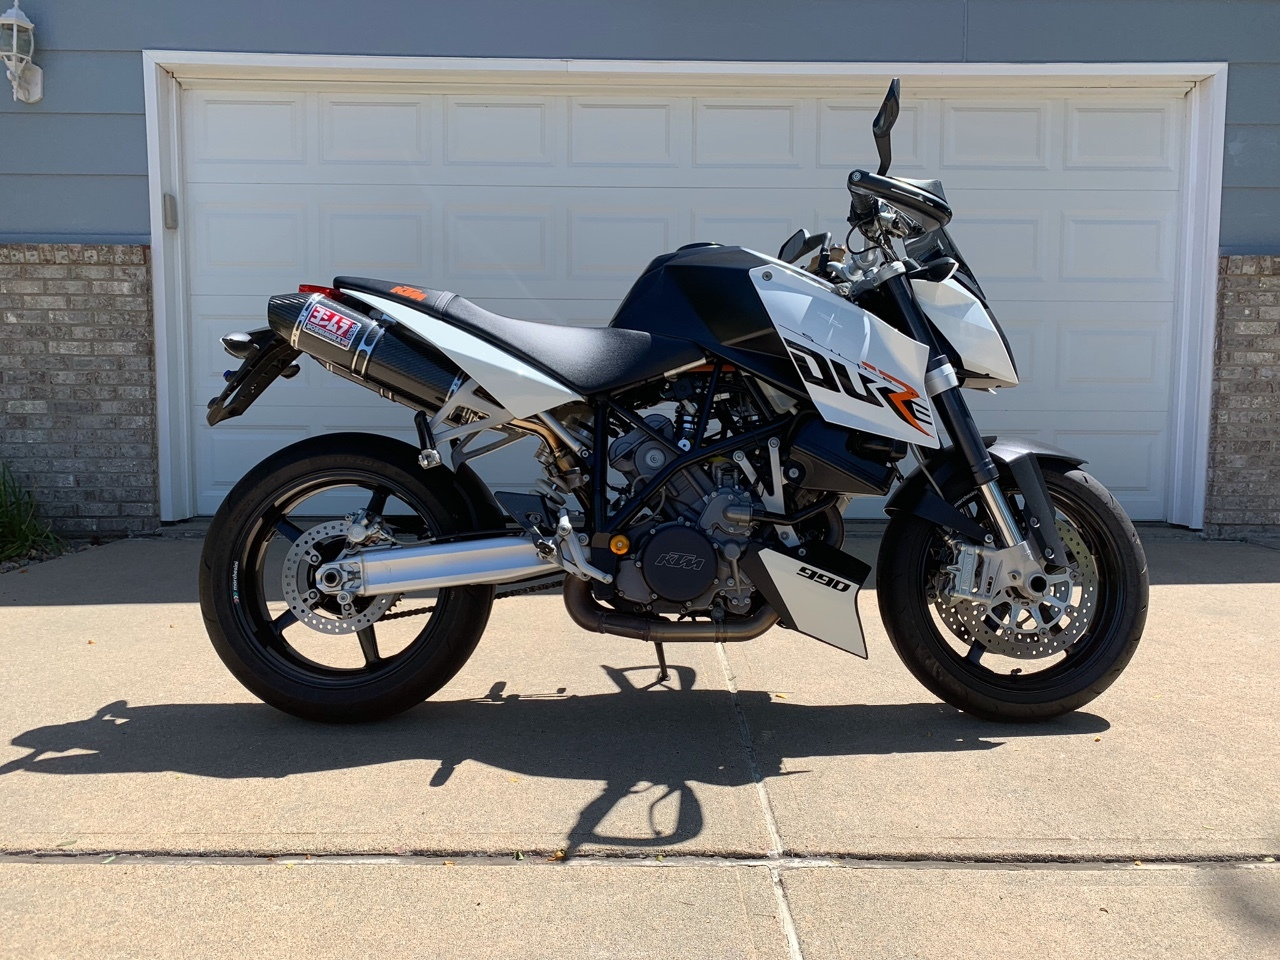 Ktm For Sale - Ktm Motorcycle,ATV Four Wheeler,Side by Side,Sand